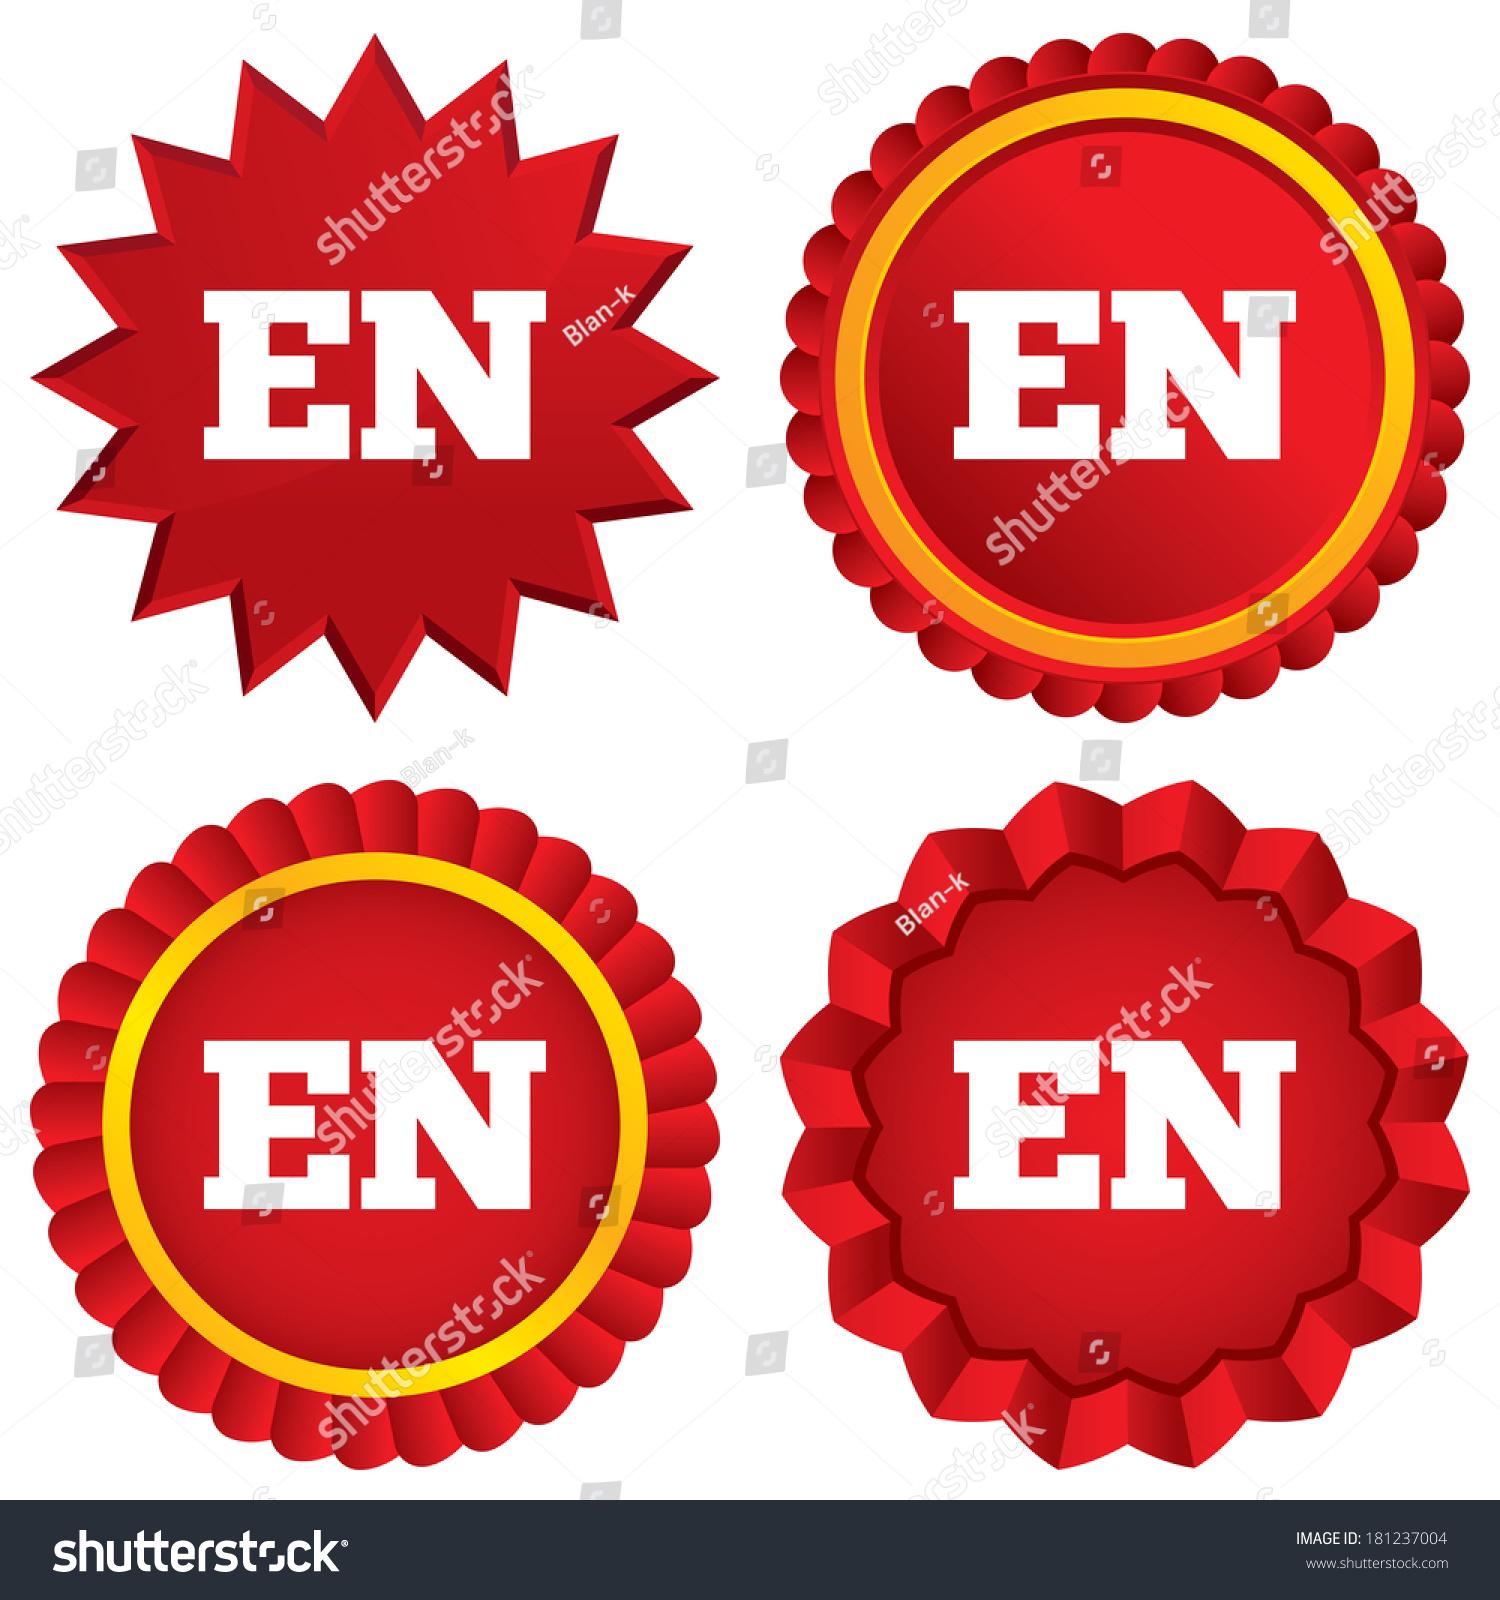 Similar Images Stock Photos Vectors Of English Language Sign Icon